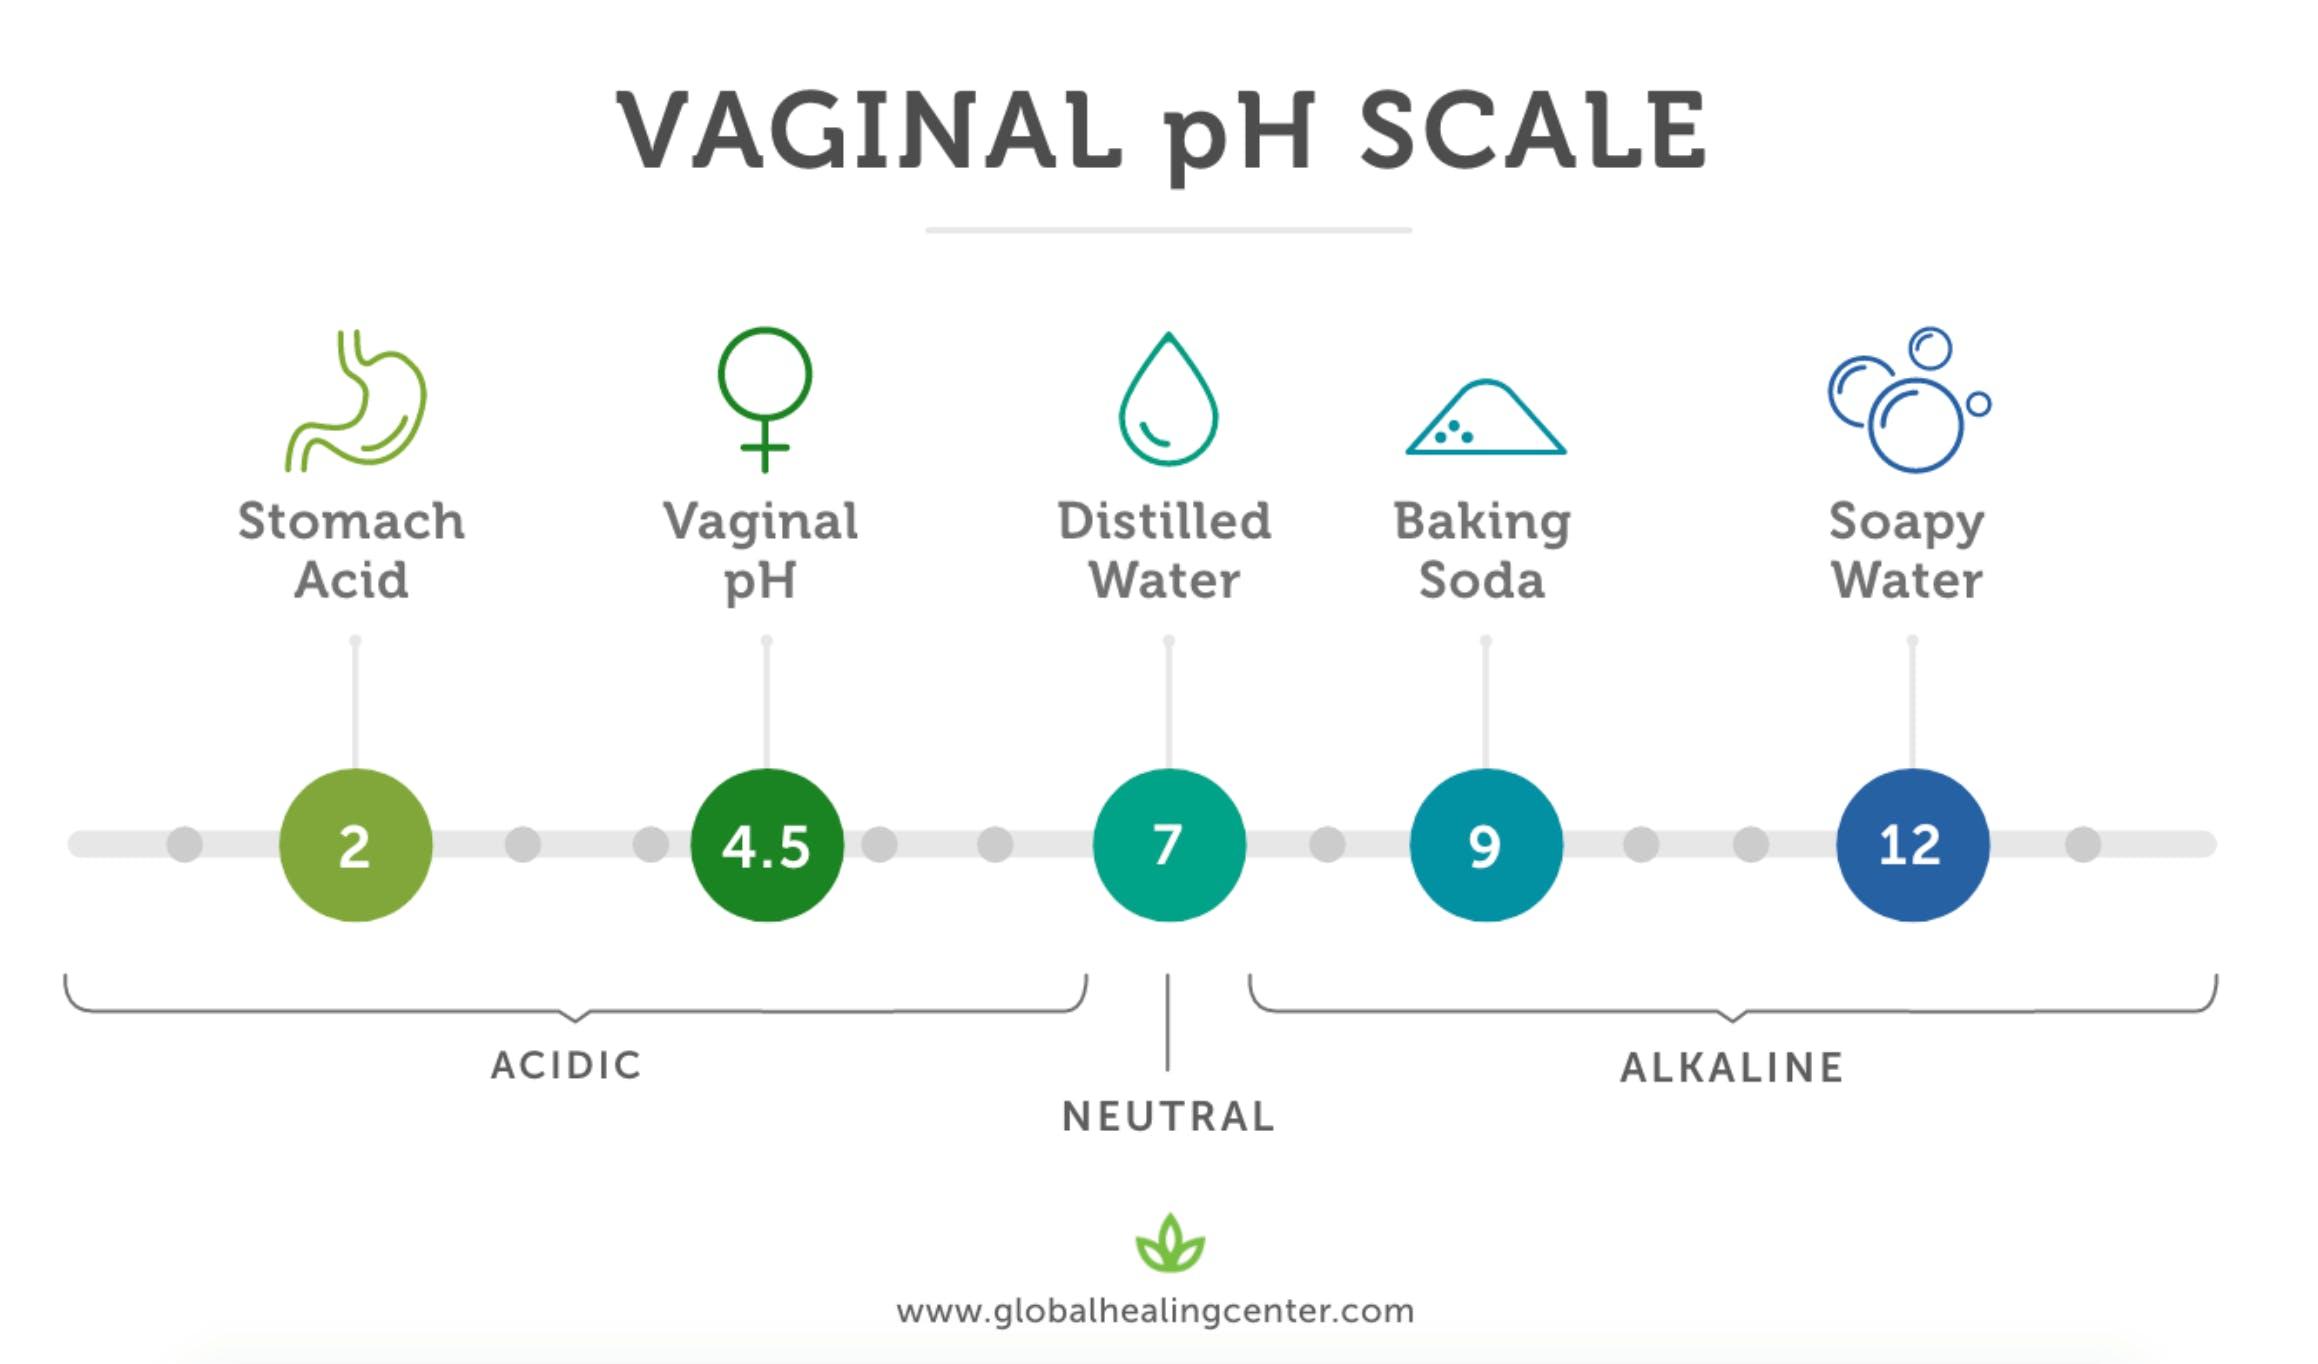 vaginal ph scale